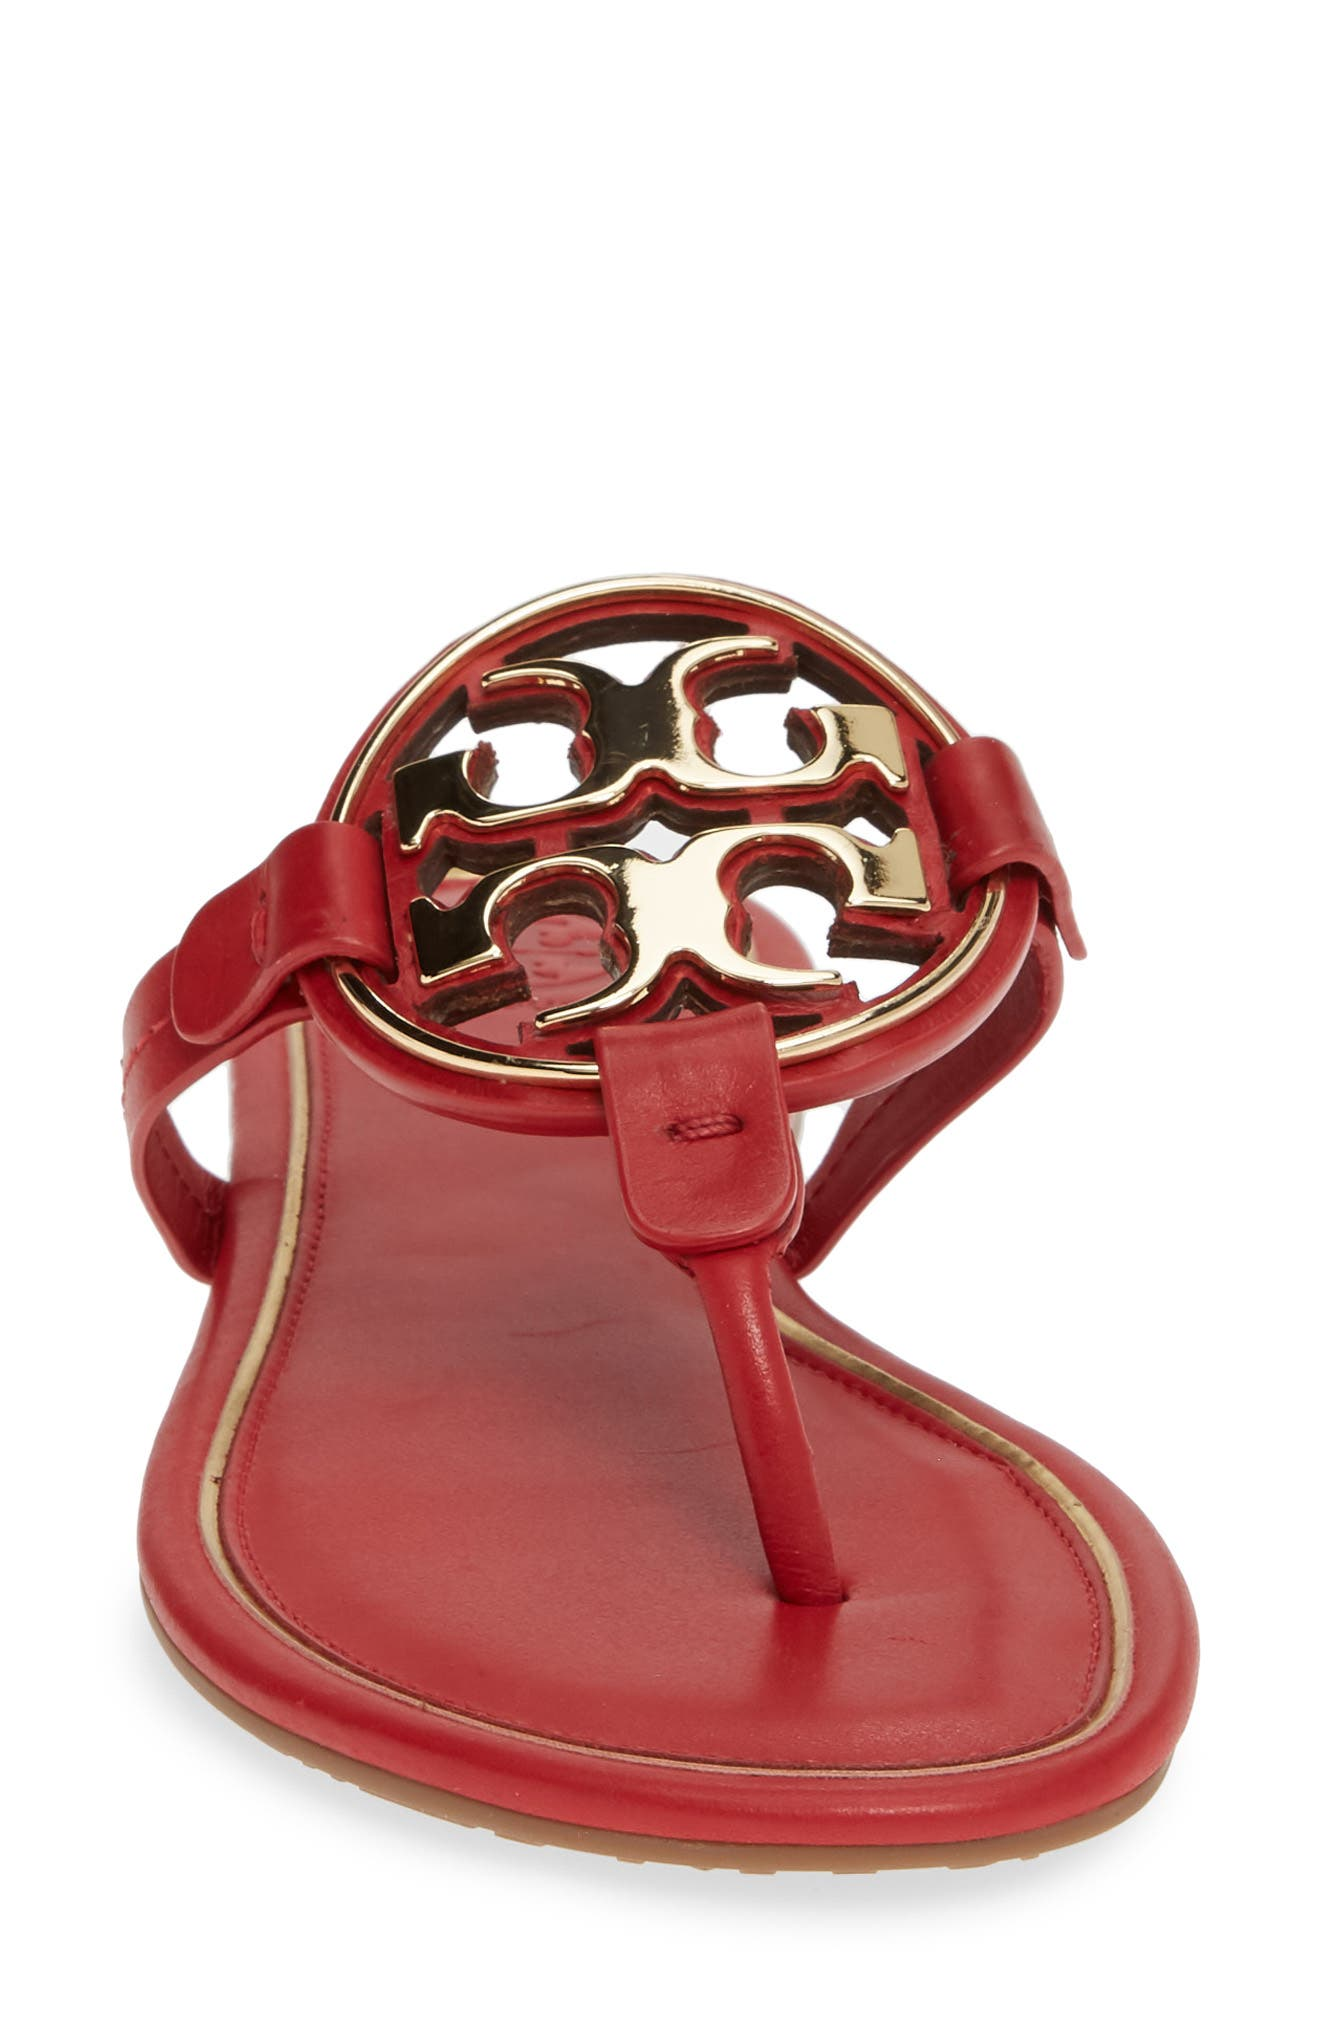 TORY BURCH, Metal Miller Flip Flop, Alternate thumbnail 4, color, BRILLIANT RED/ GOLD